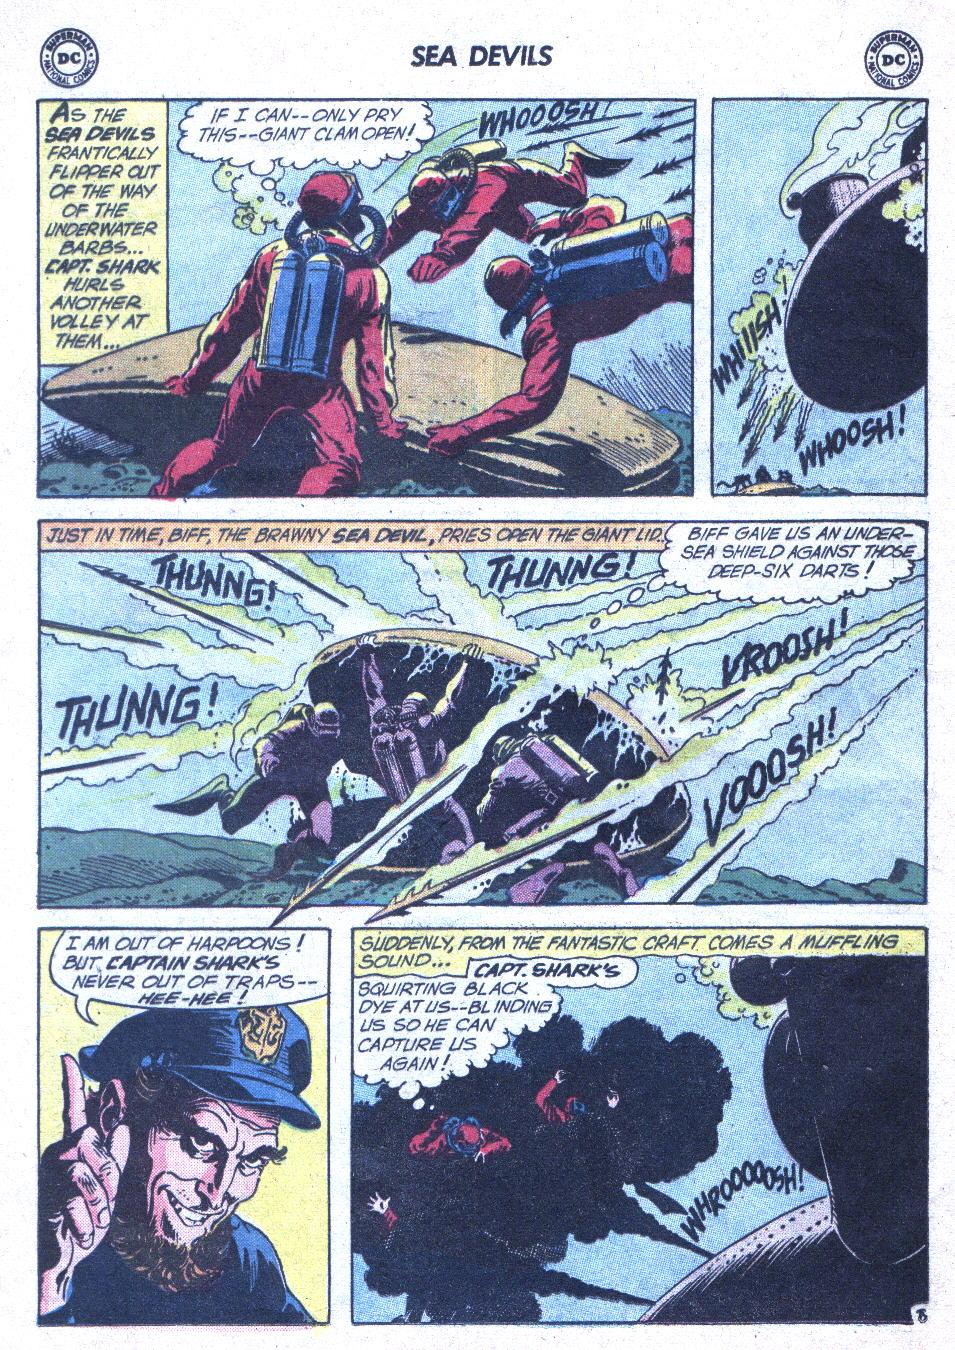 Read online Sea Devils comic -  Issue #1 - 29